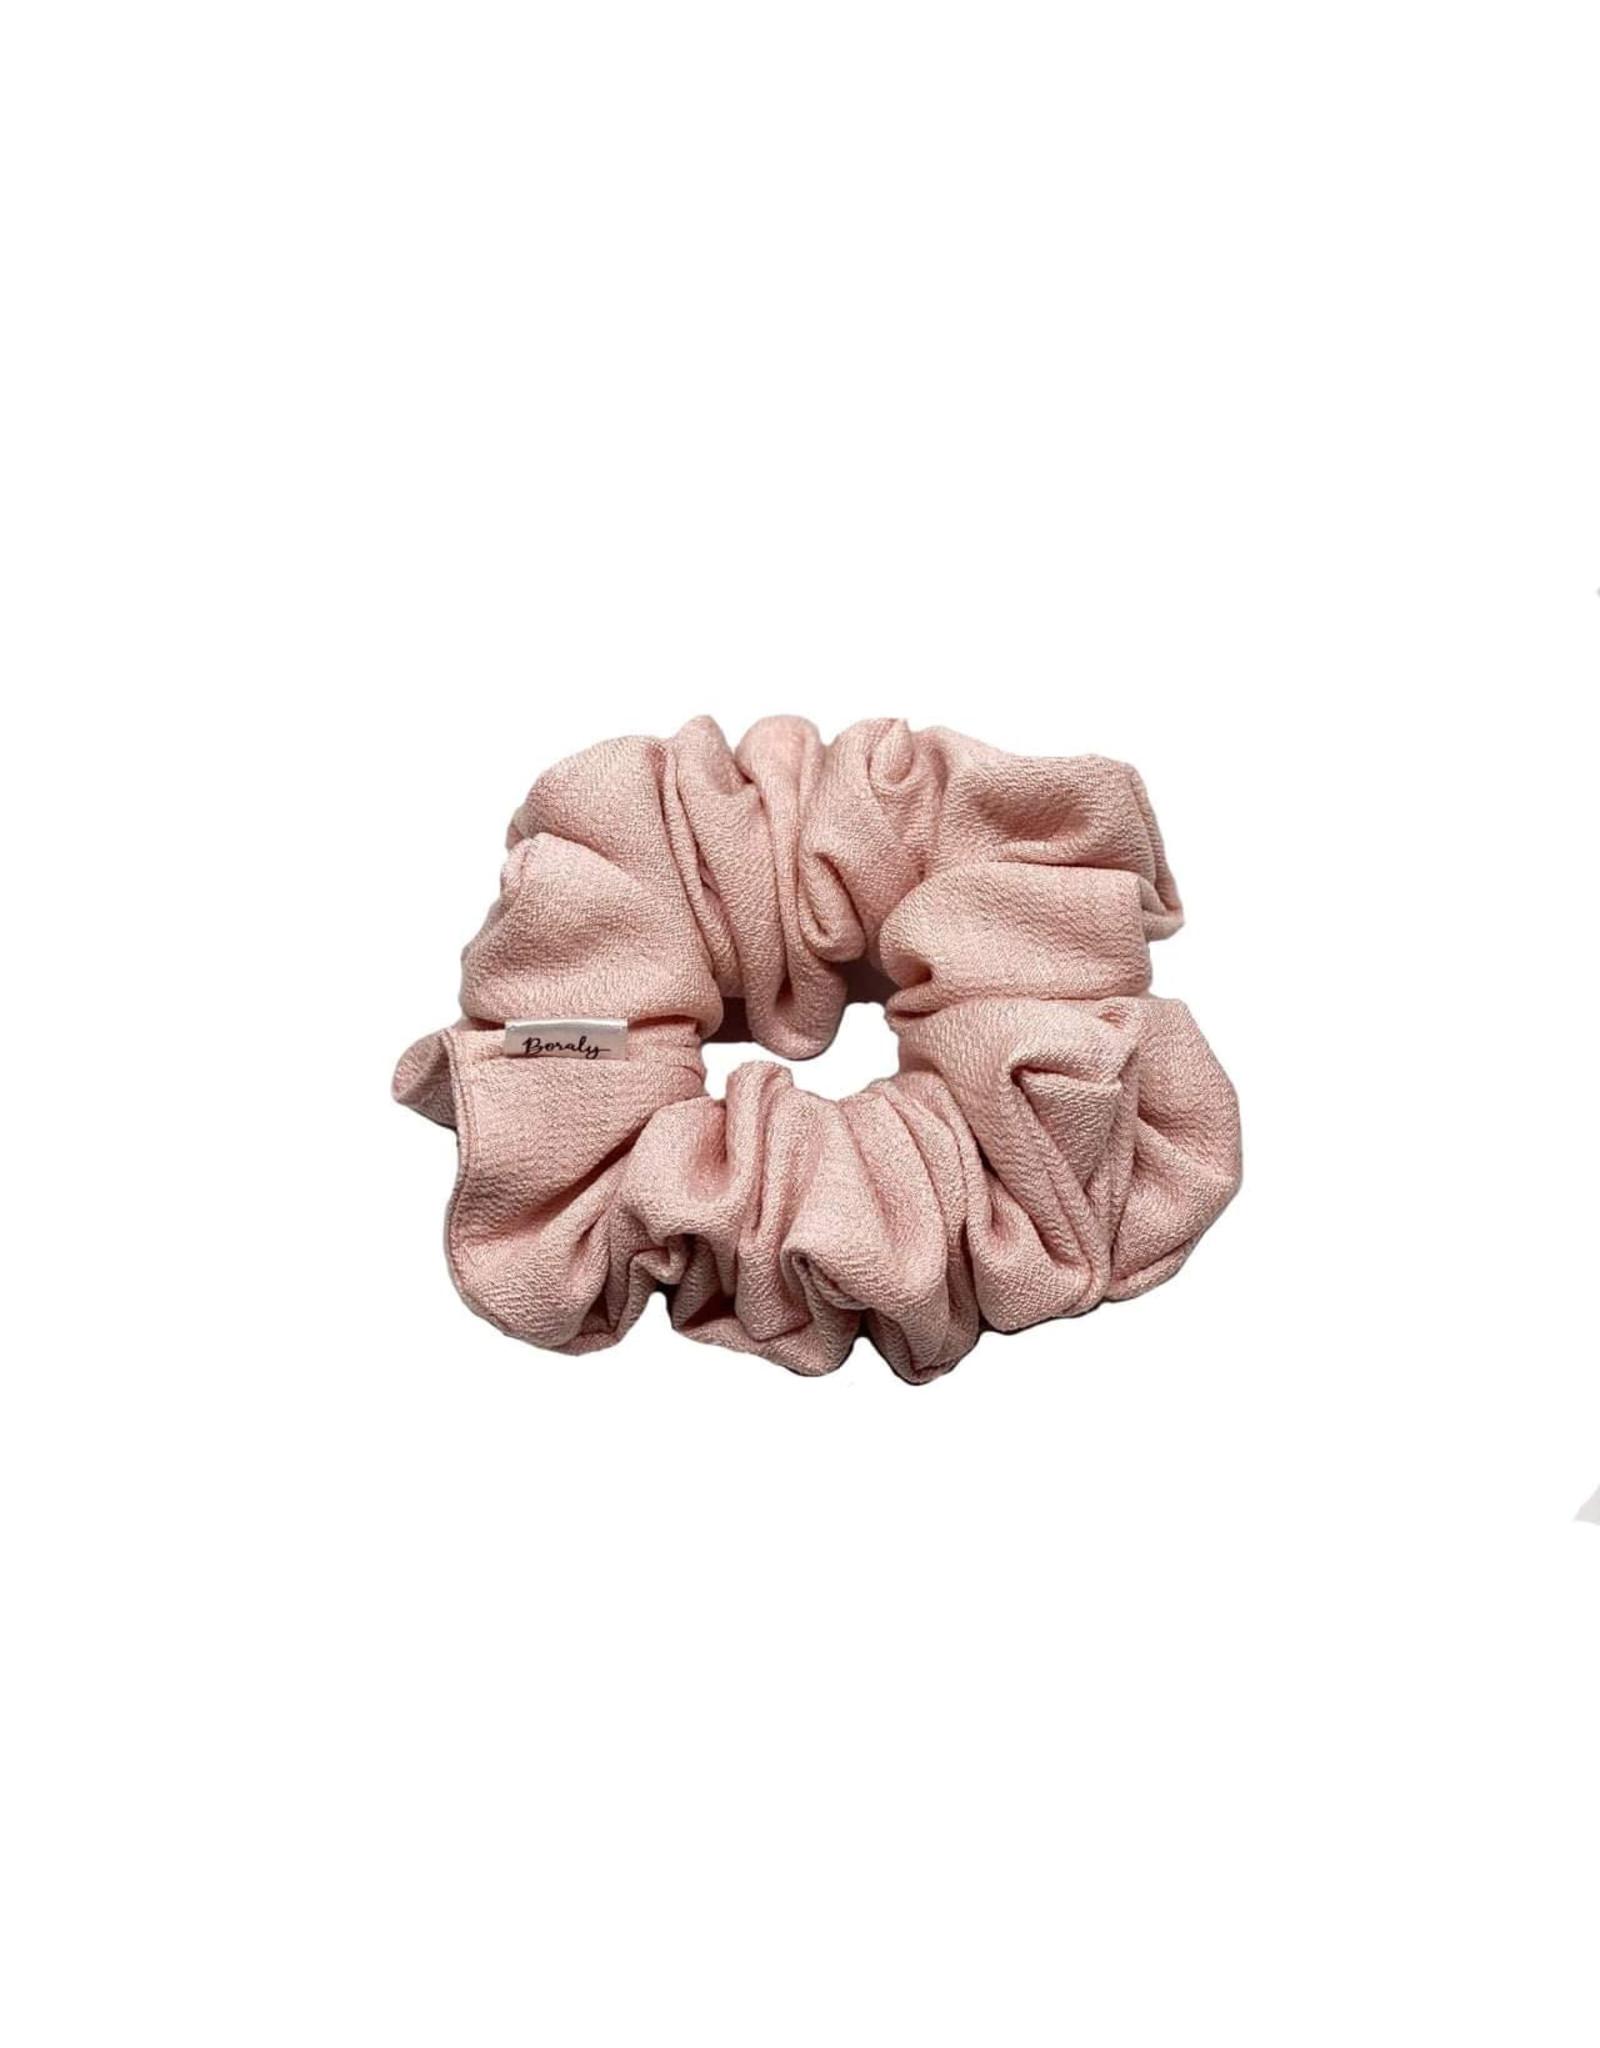 Boraly créations Chouchou - Lin rose